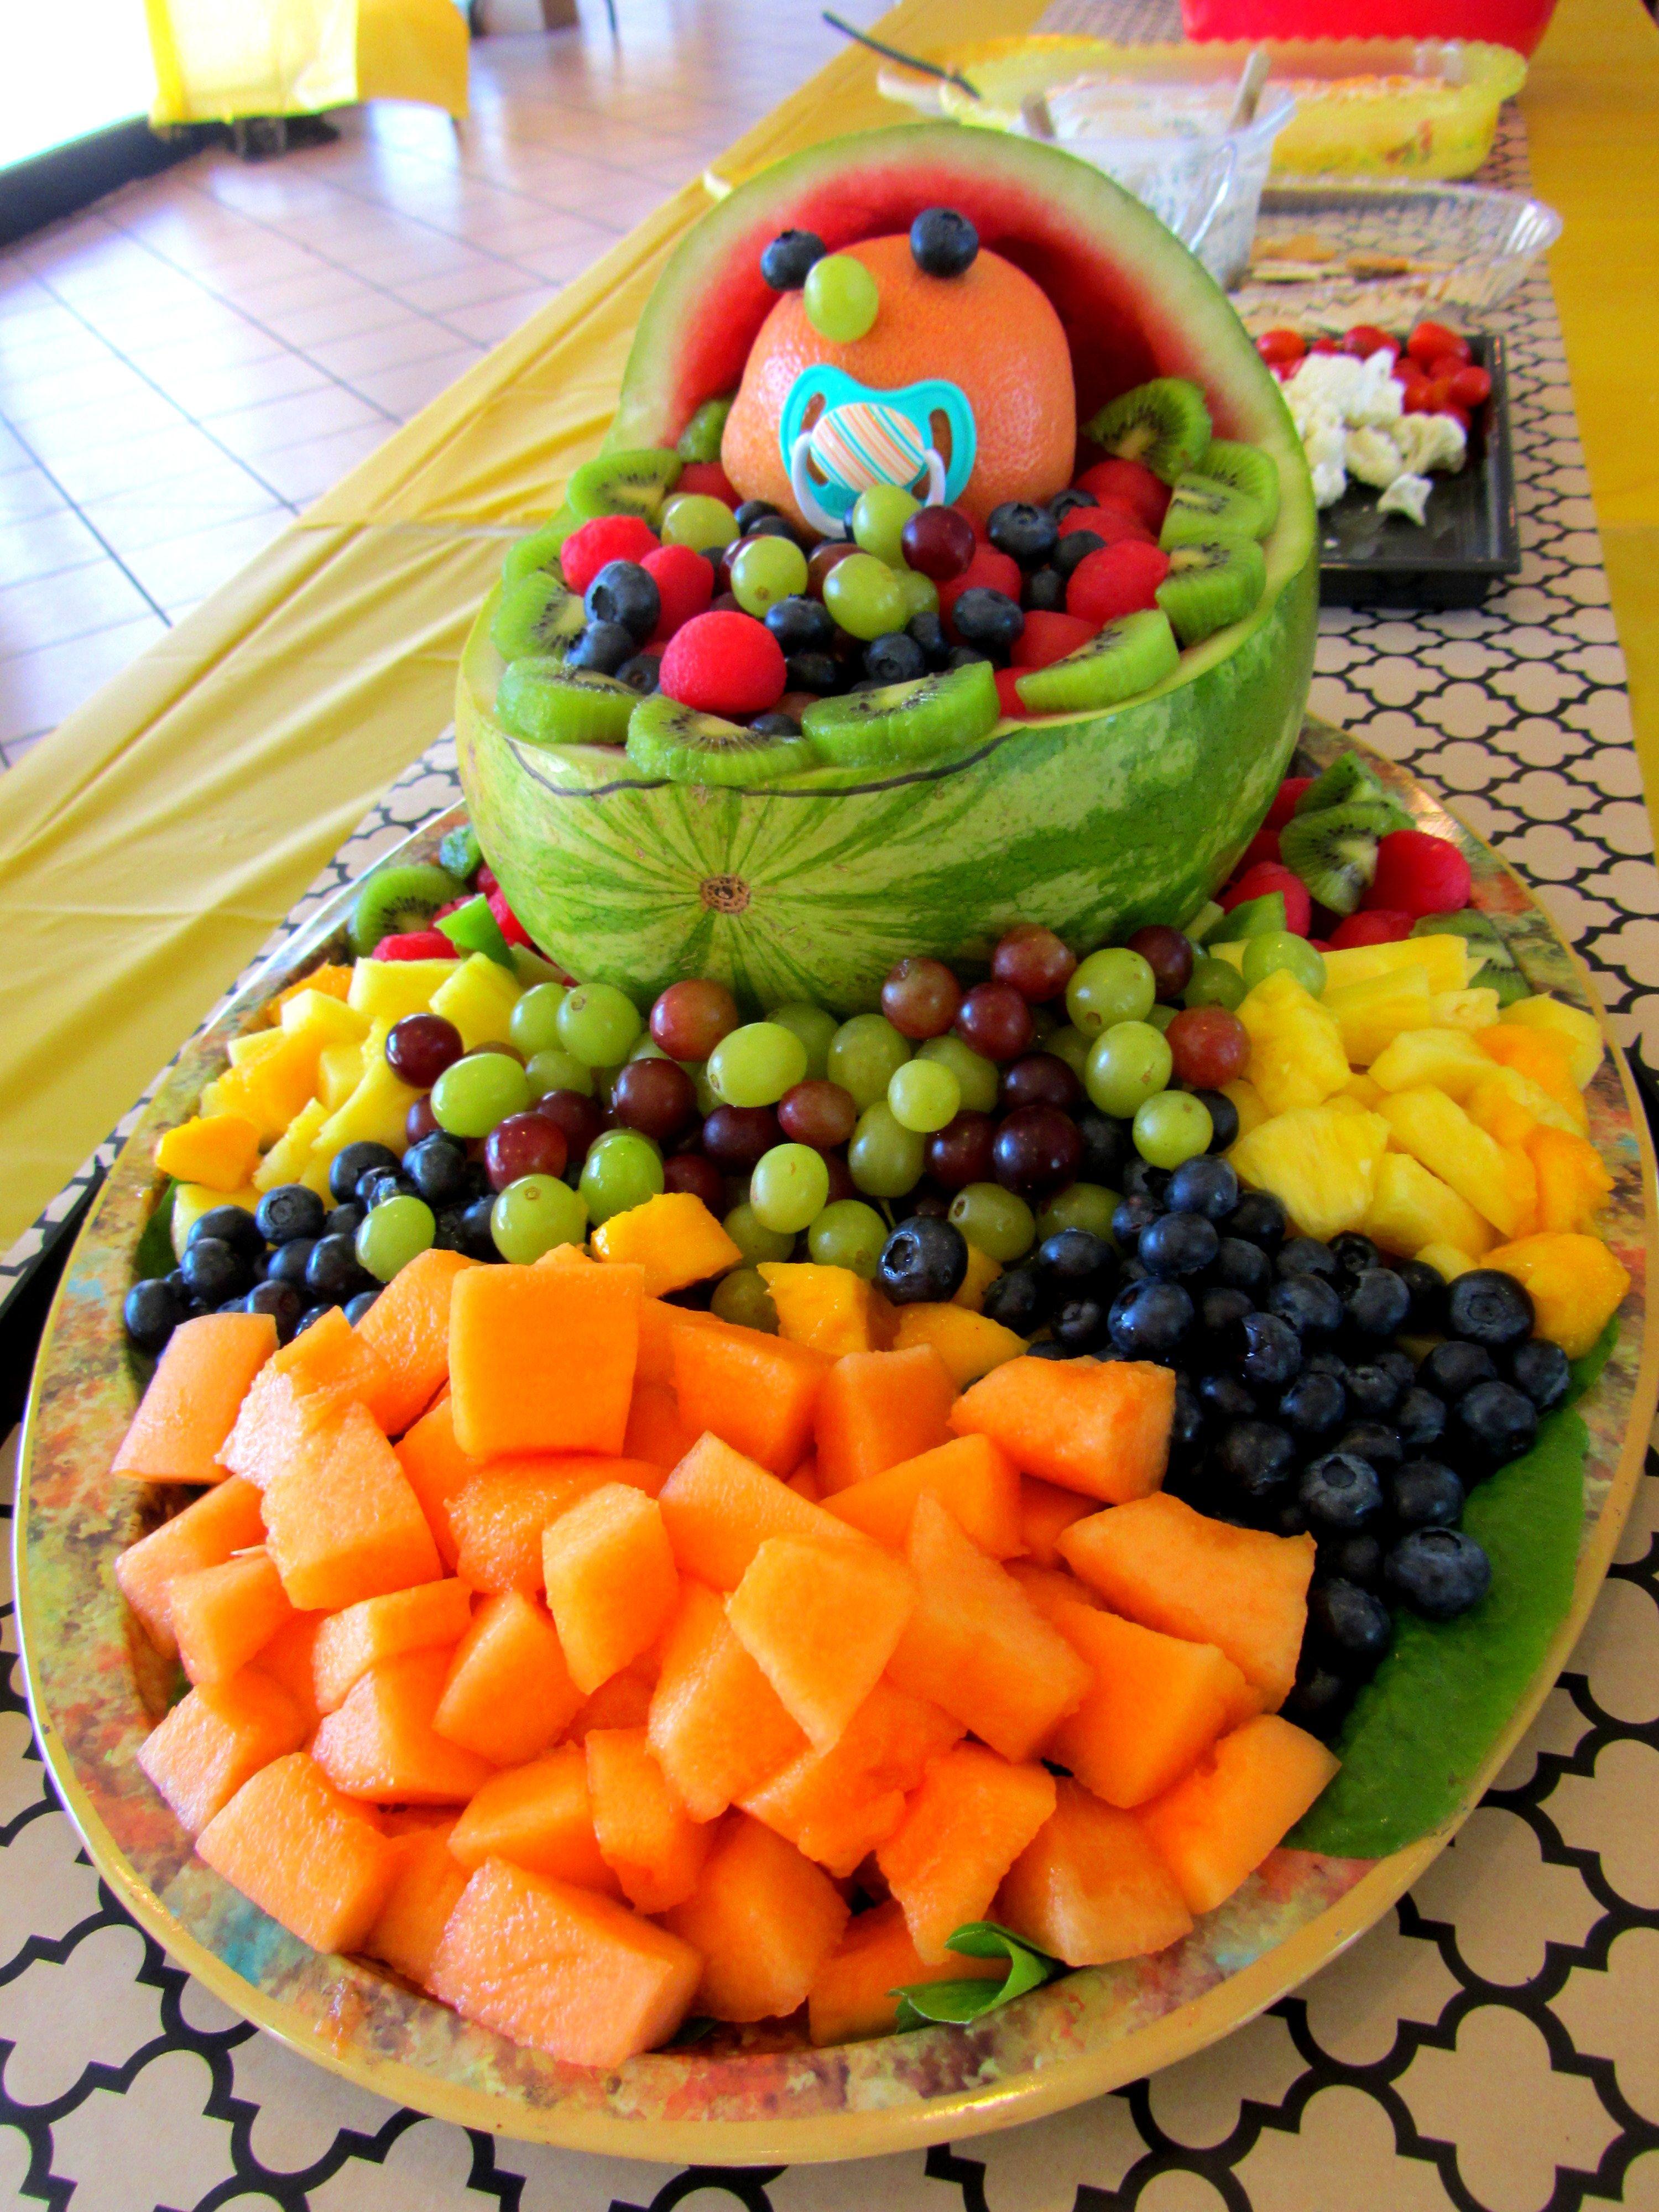 Baby Shower Fruit Tray Ideas : shower, fruit, ideas, Patti, Carnell, Julie, Cruise, Director, Shower, Fruit, Tray,, Fruit,